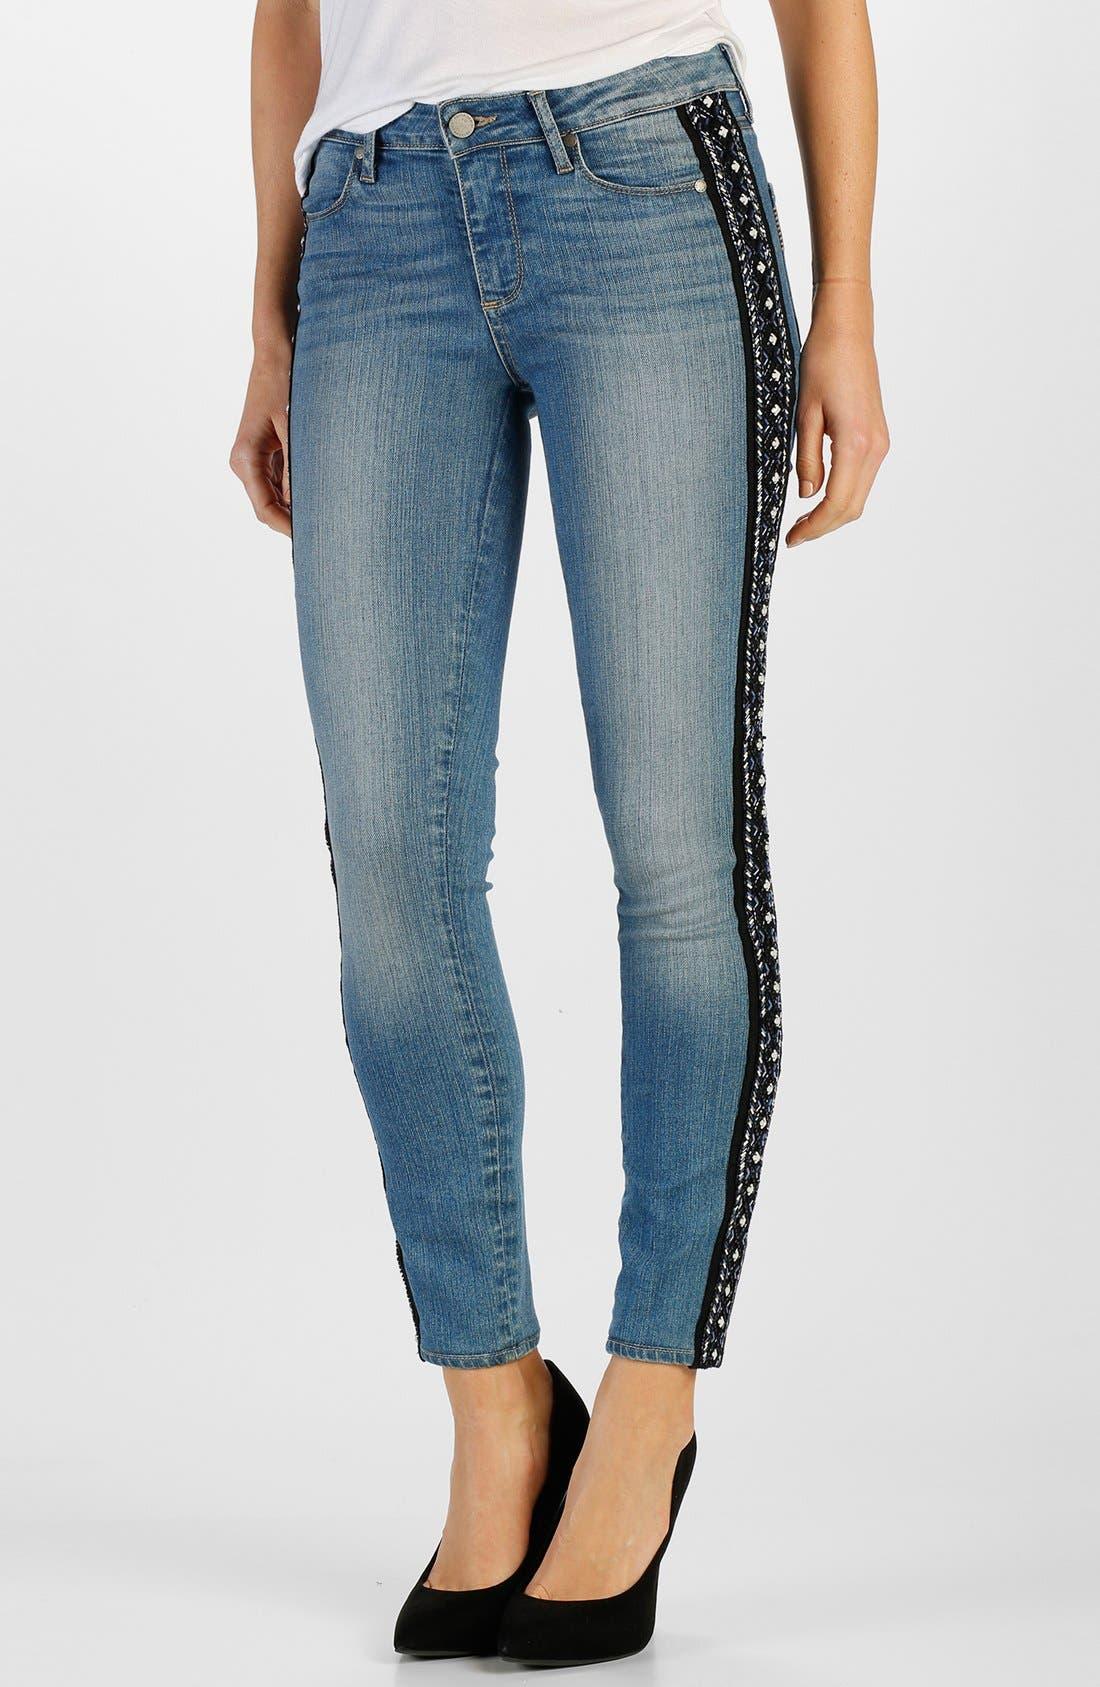 Main Image - Paige Denim 'Verdugo' Ankle Ultra Skinny Jeans (Paulina Tux Embellished)